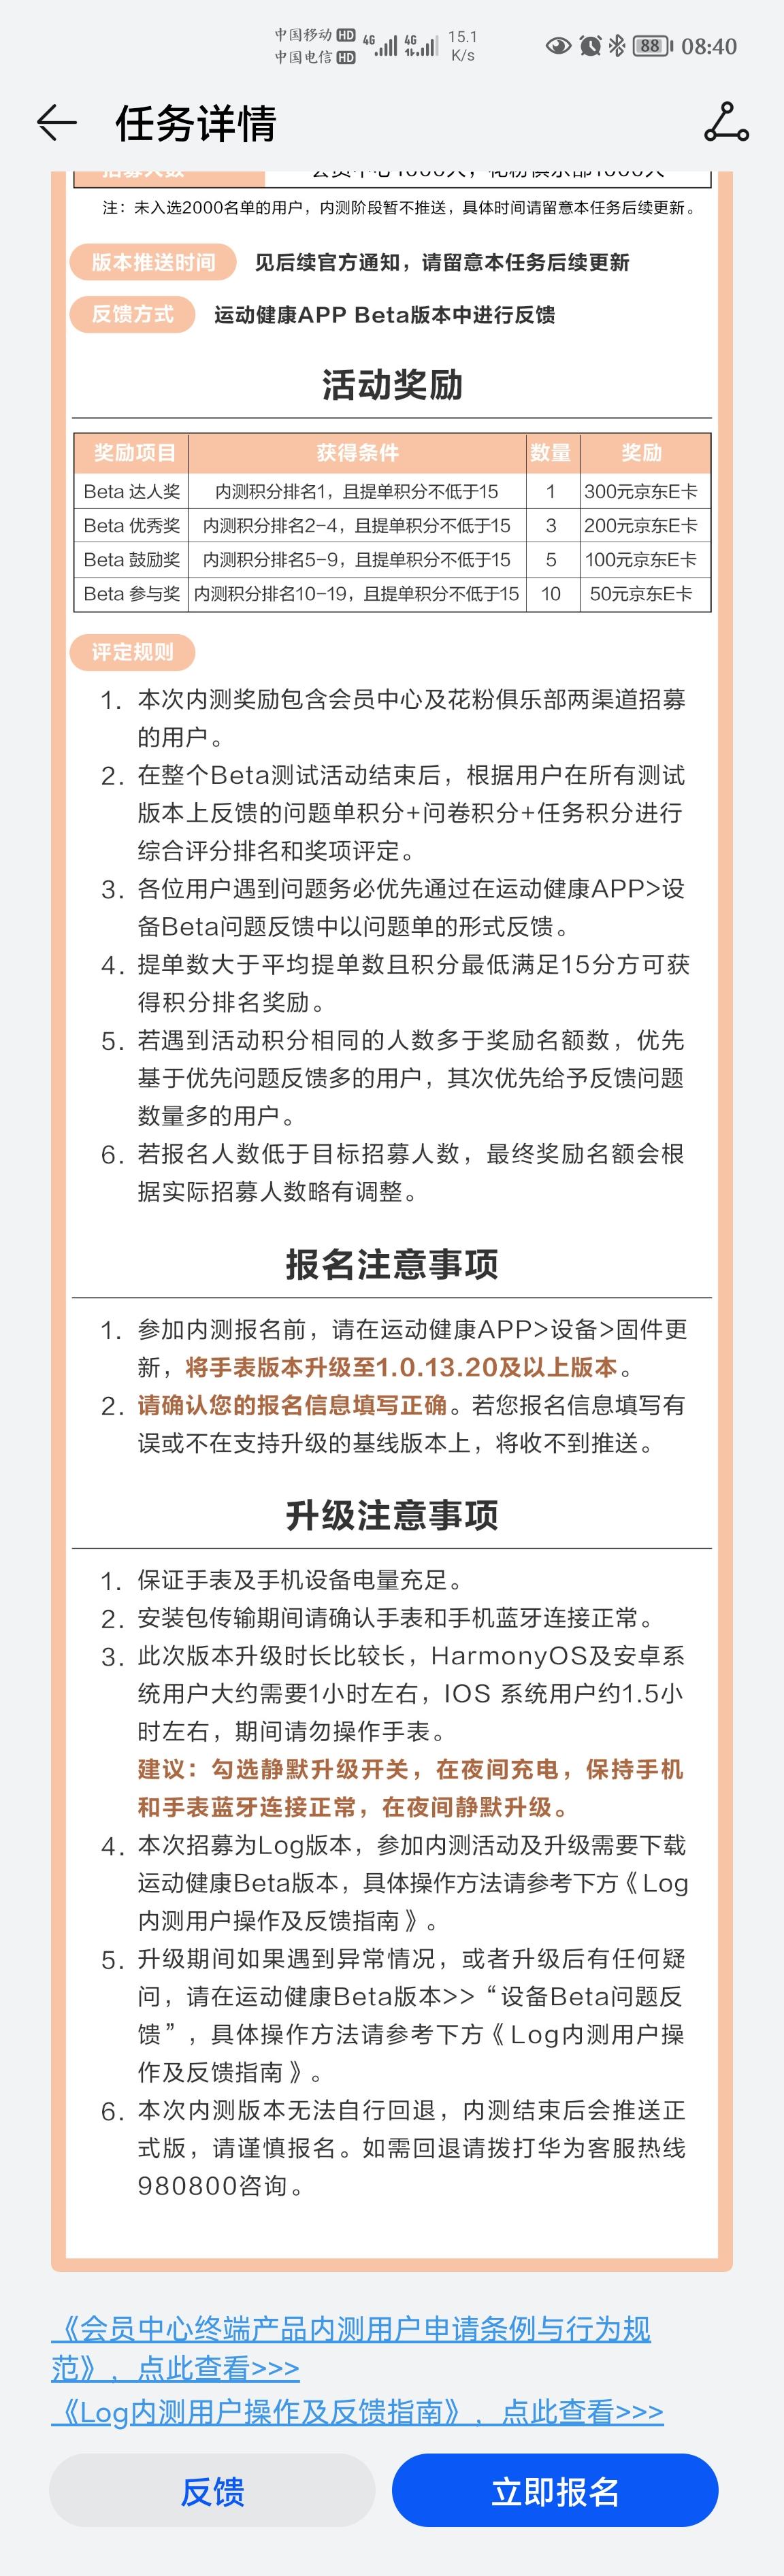 Screenshot_20210908_084040_com.huawei.mycenter.jpg